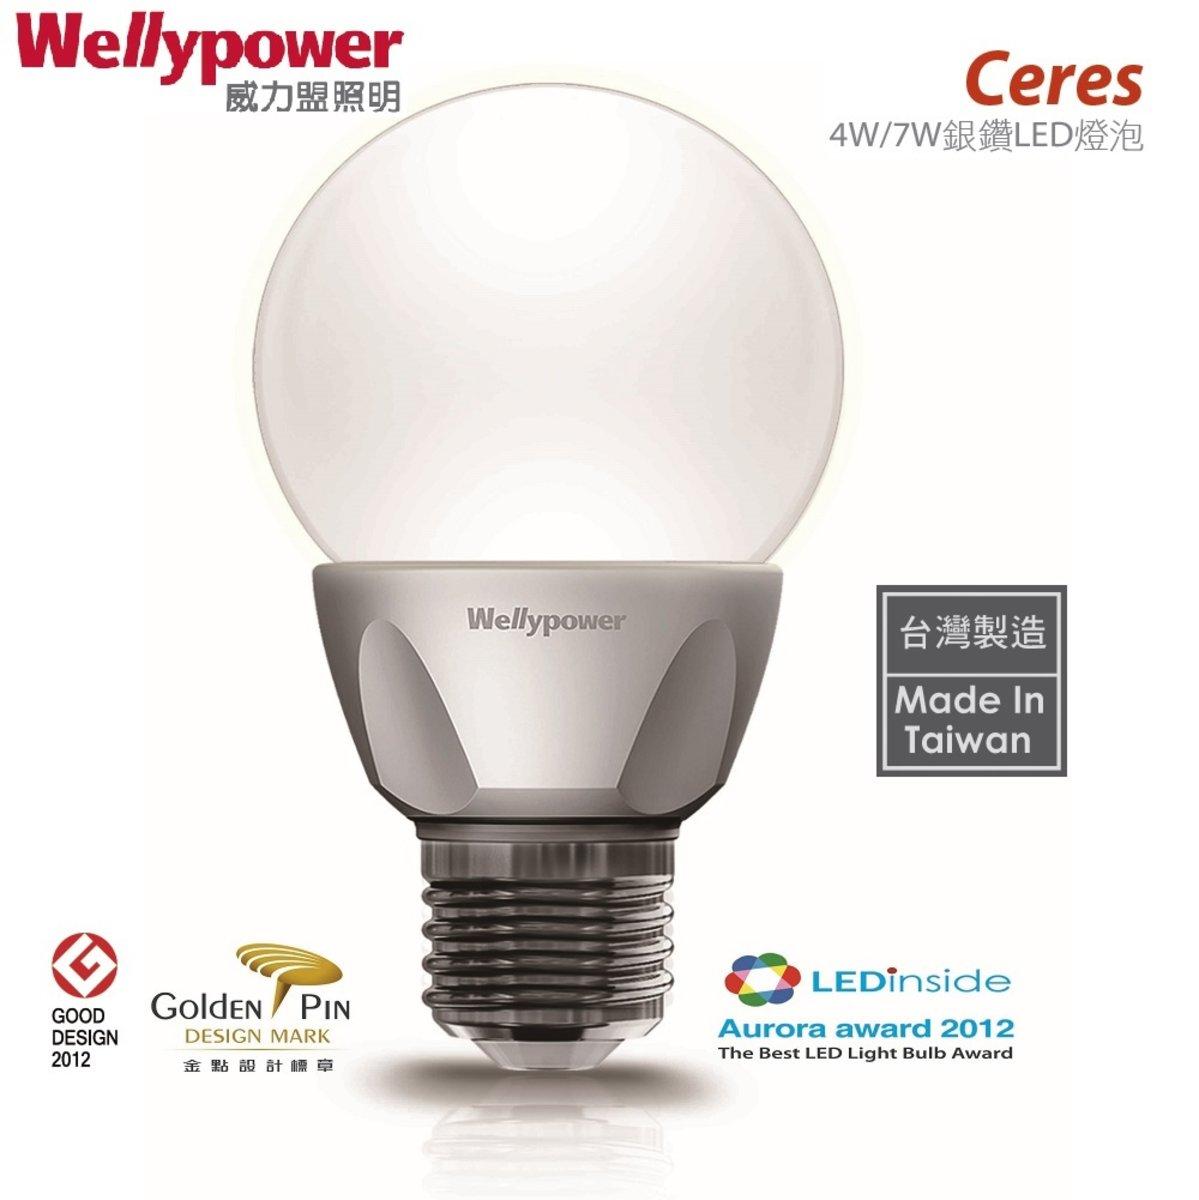 3 Pieces x Ceres LED Bulb 4W Warm White 2700K E27